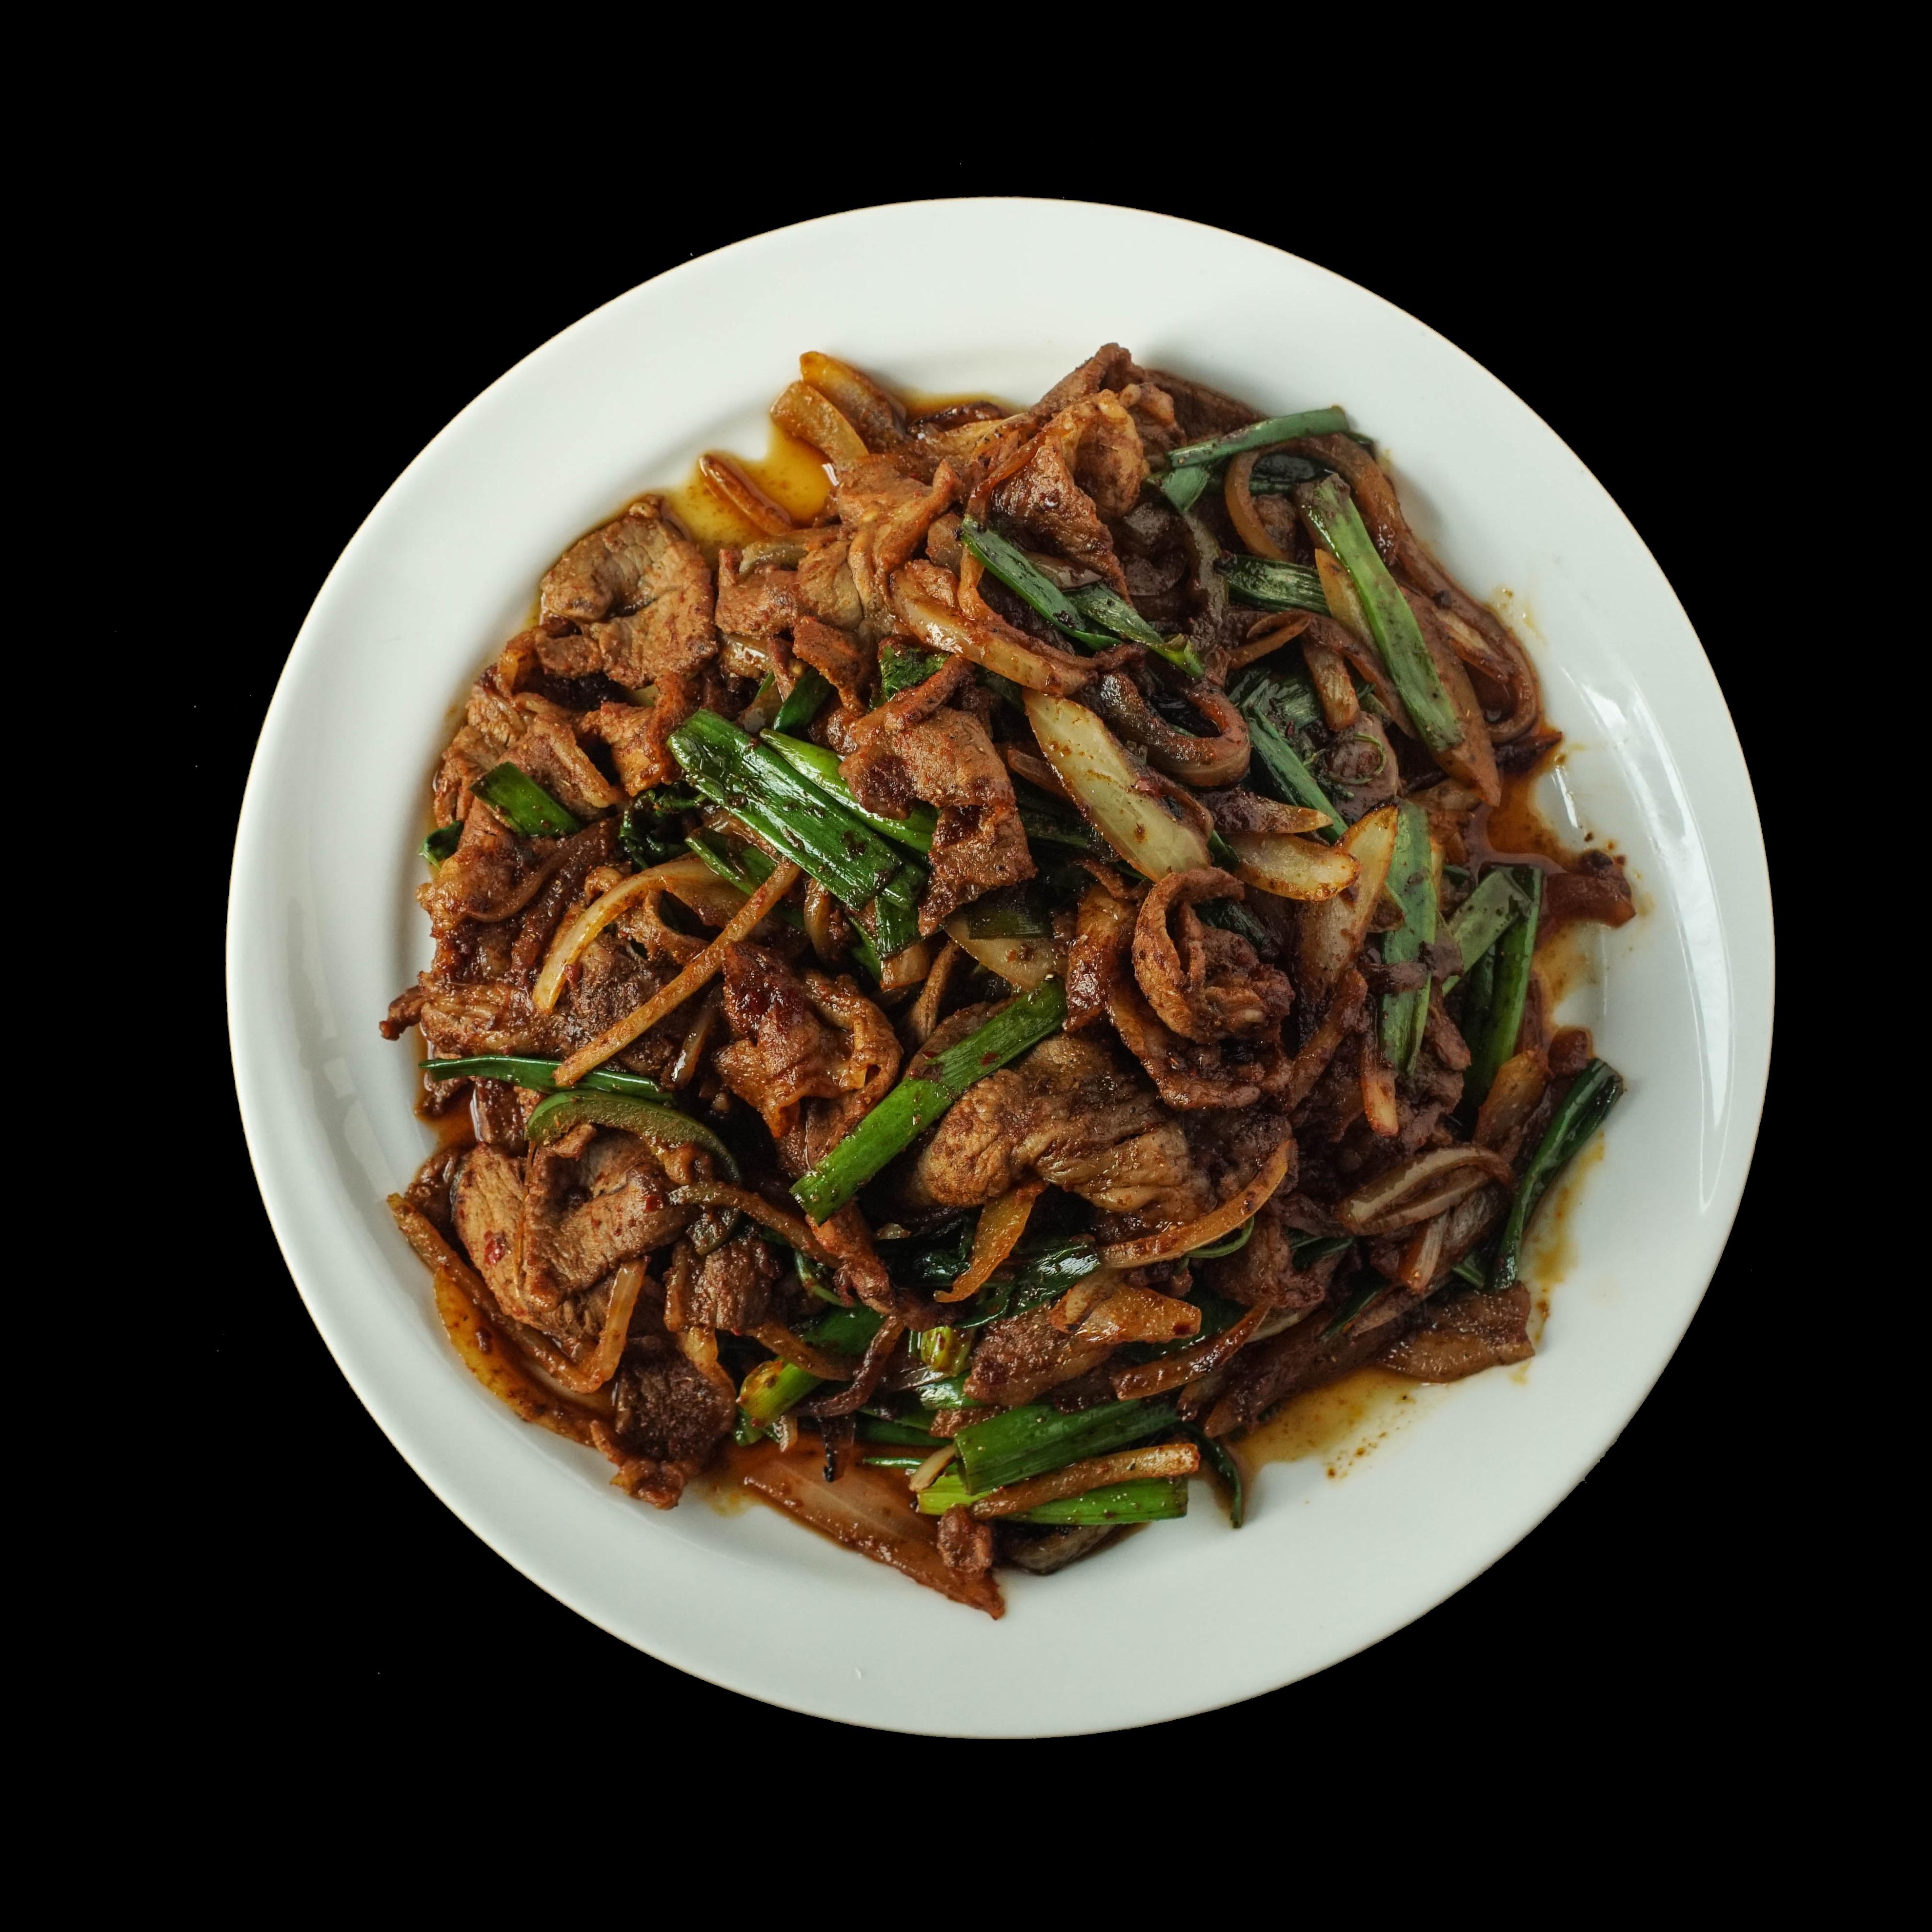 92. 孜然牛肉 Cumin Beef Image